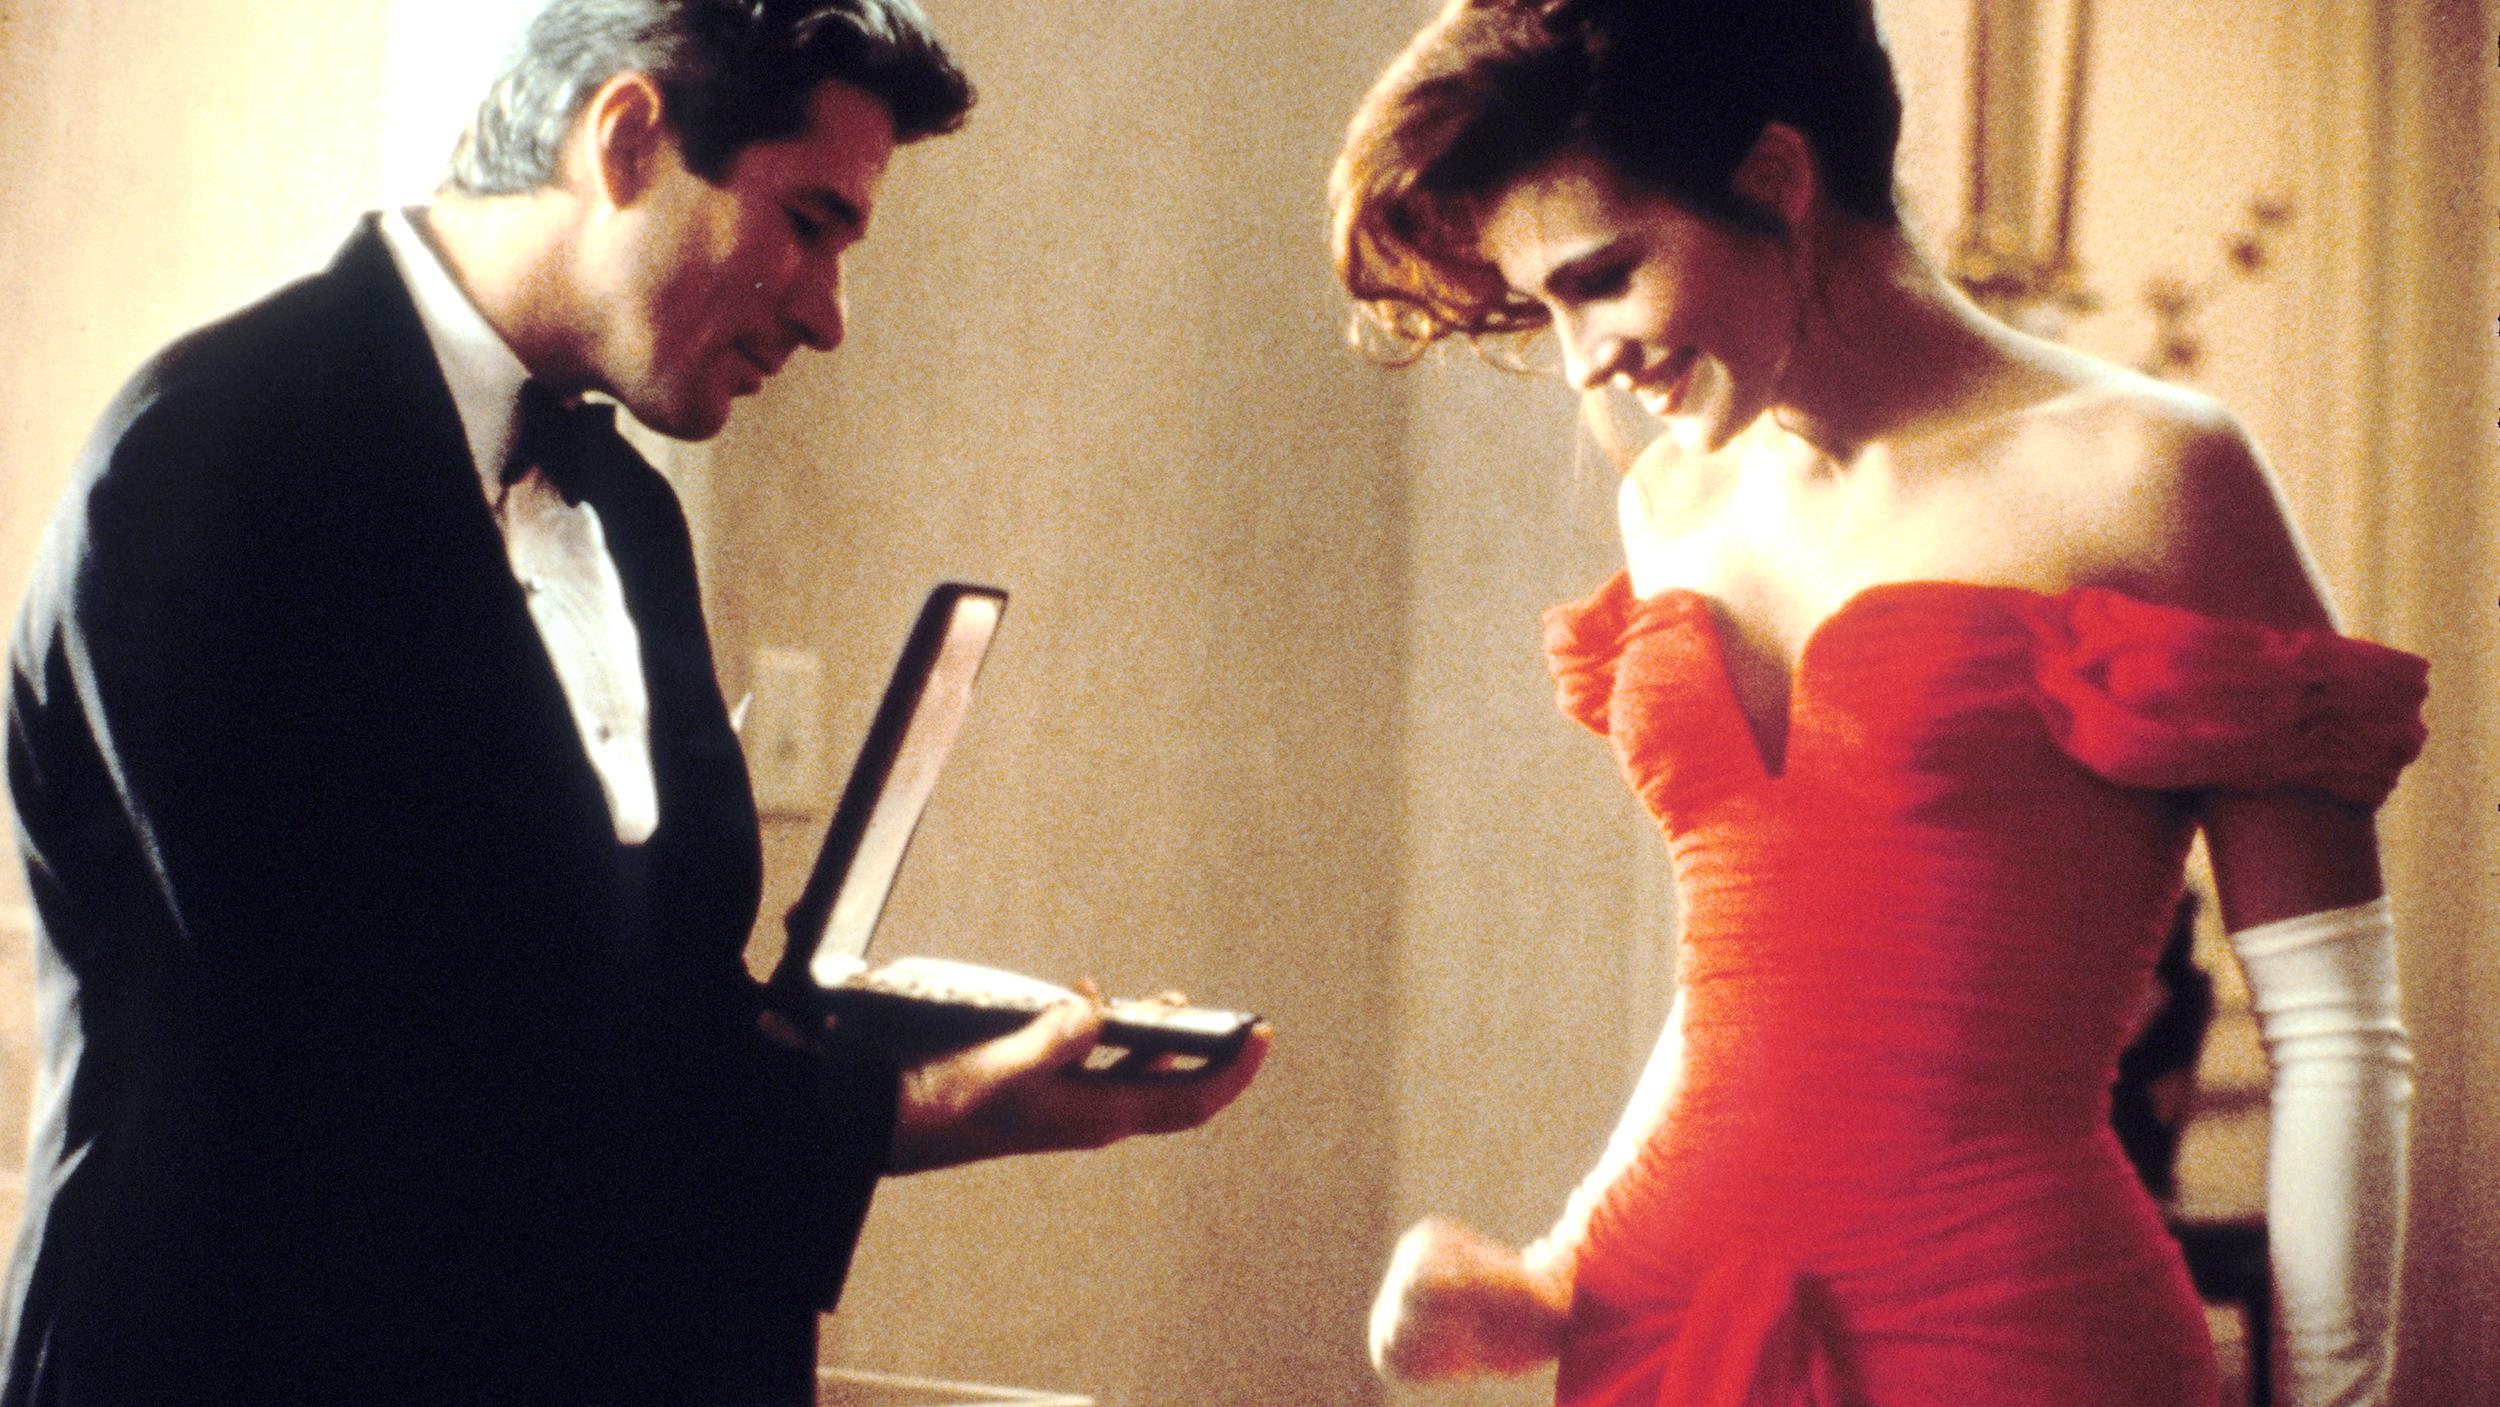 Show' Plot On 'pretty Delivers Diane Shocker 'late Late Lane Woman' fY6gyb7